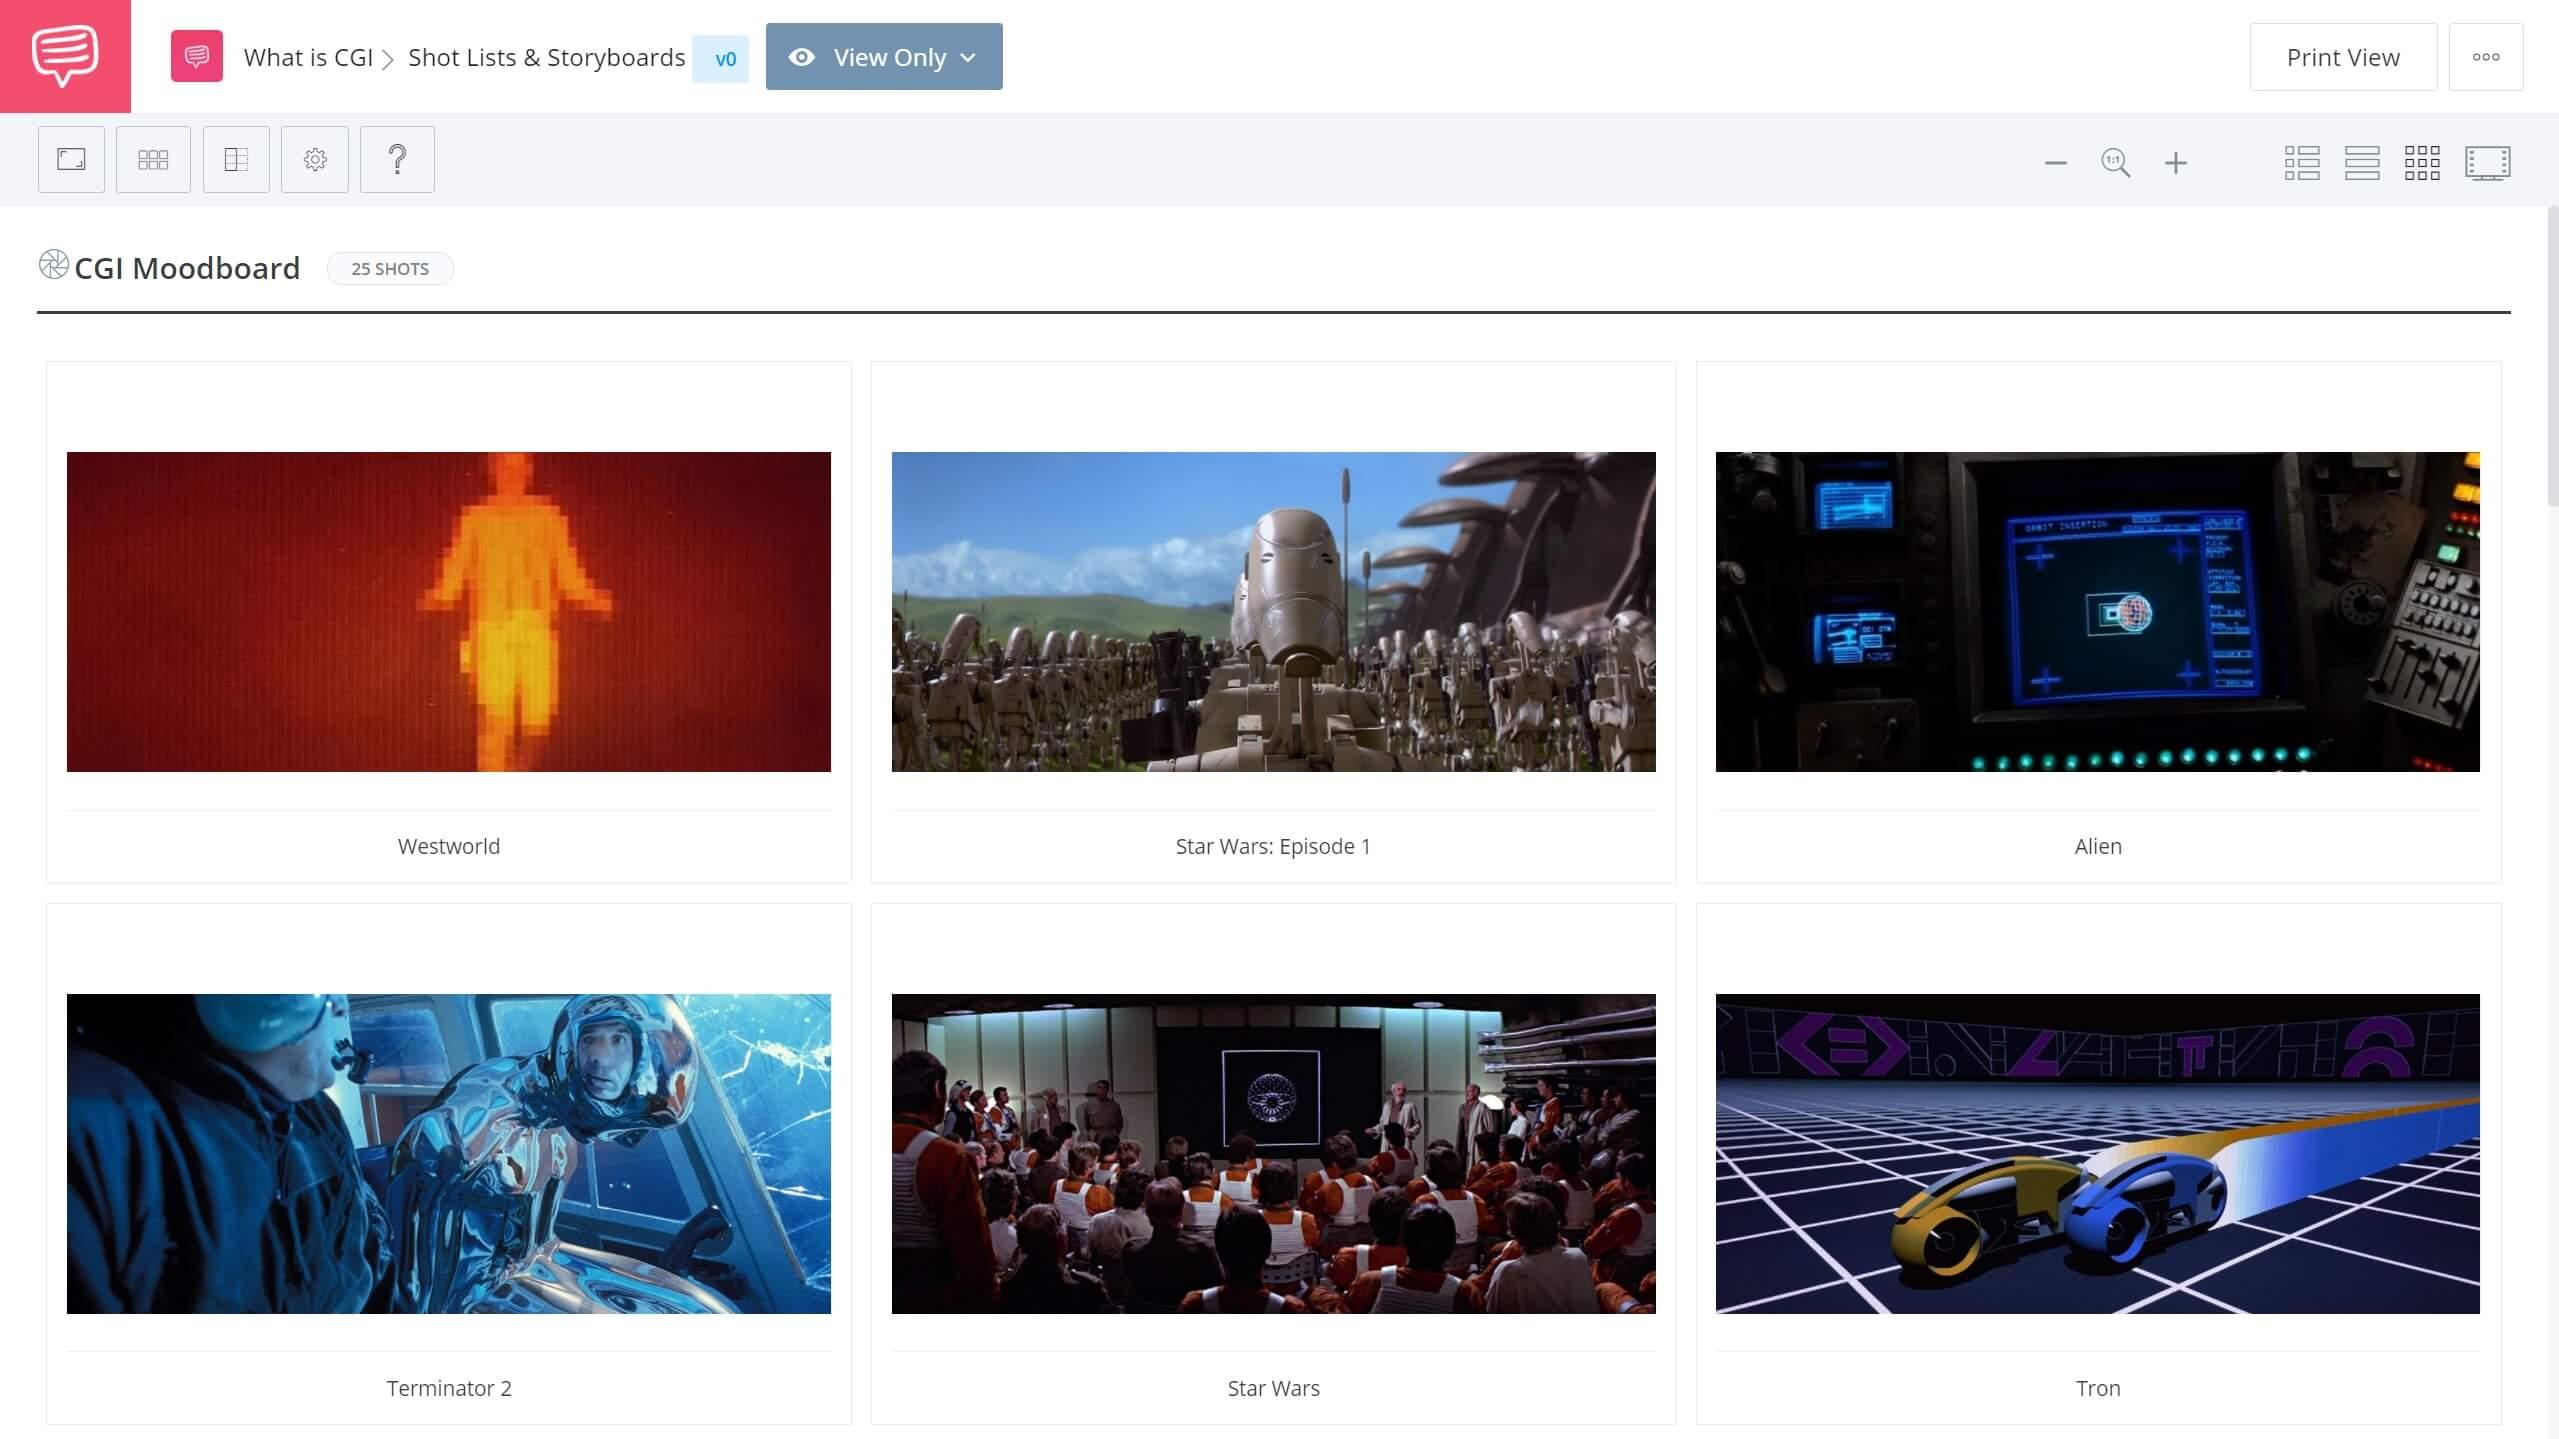 What is CGI - CGI Moodboard - StudioBinder Shot Listing Software